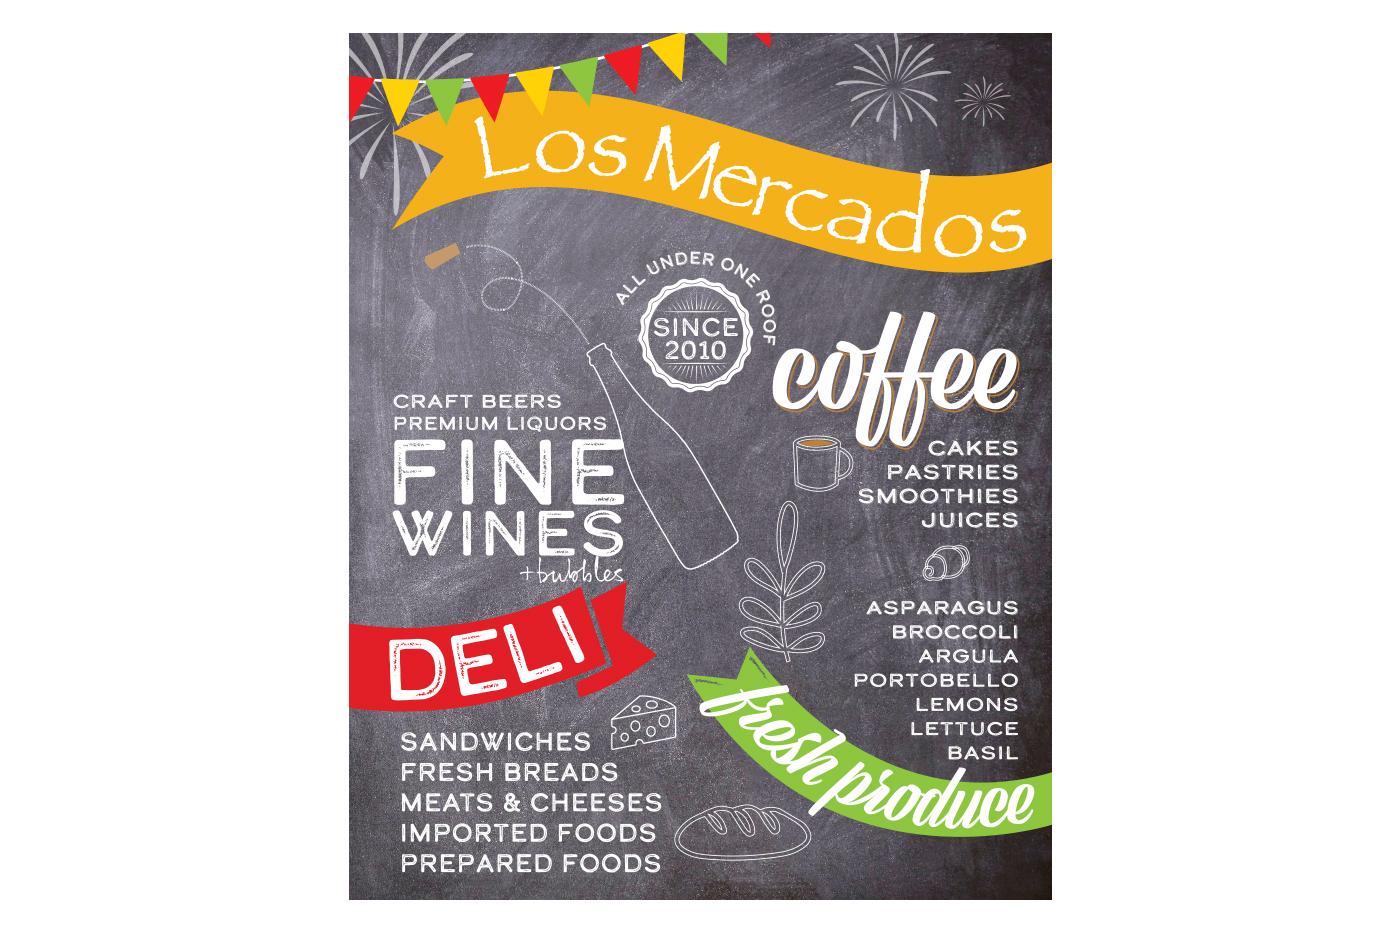 Los-Mercados-advertising-signage-sign-chalkboard.jpg